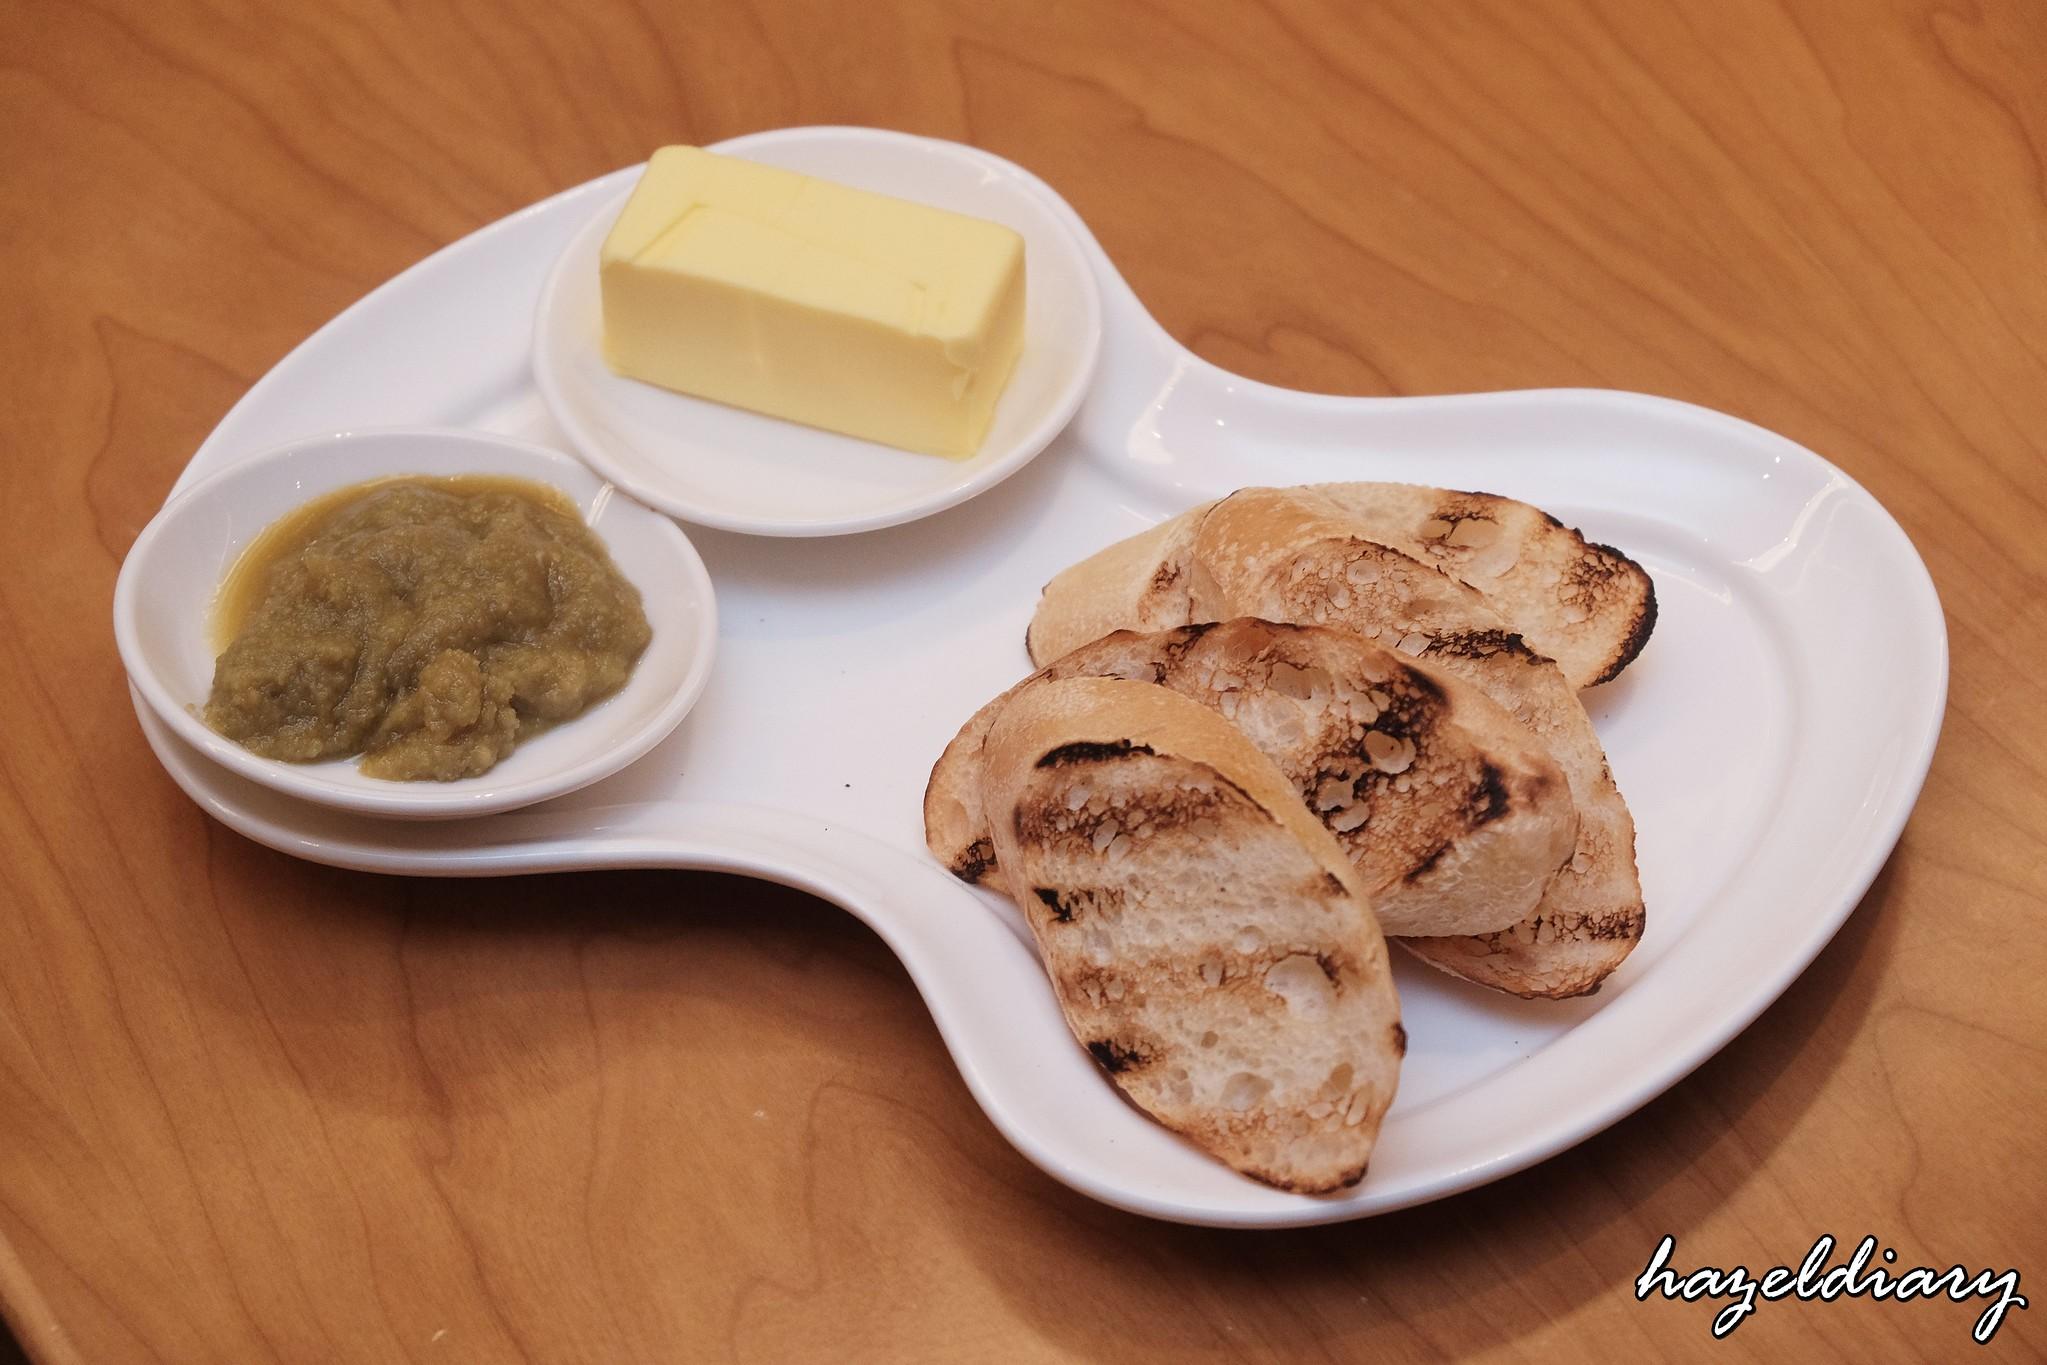 New Ubin Seafood Zhongshan Park-Kaya Toast Baguette